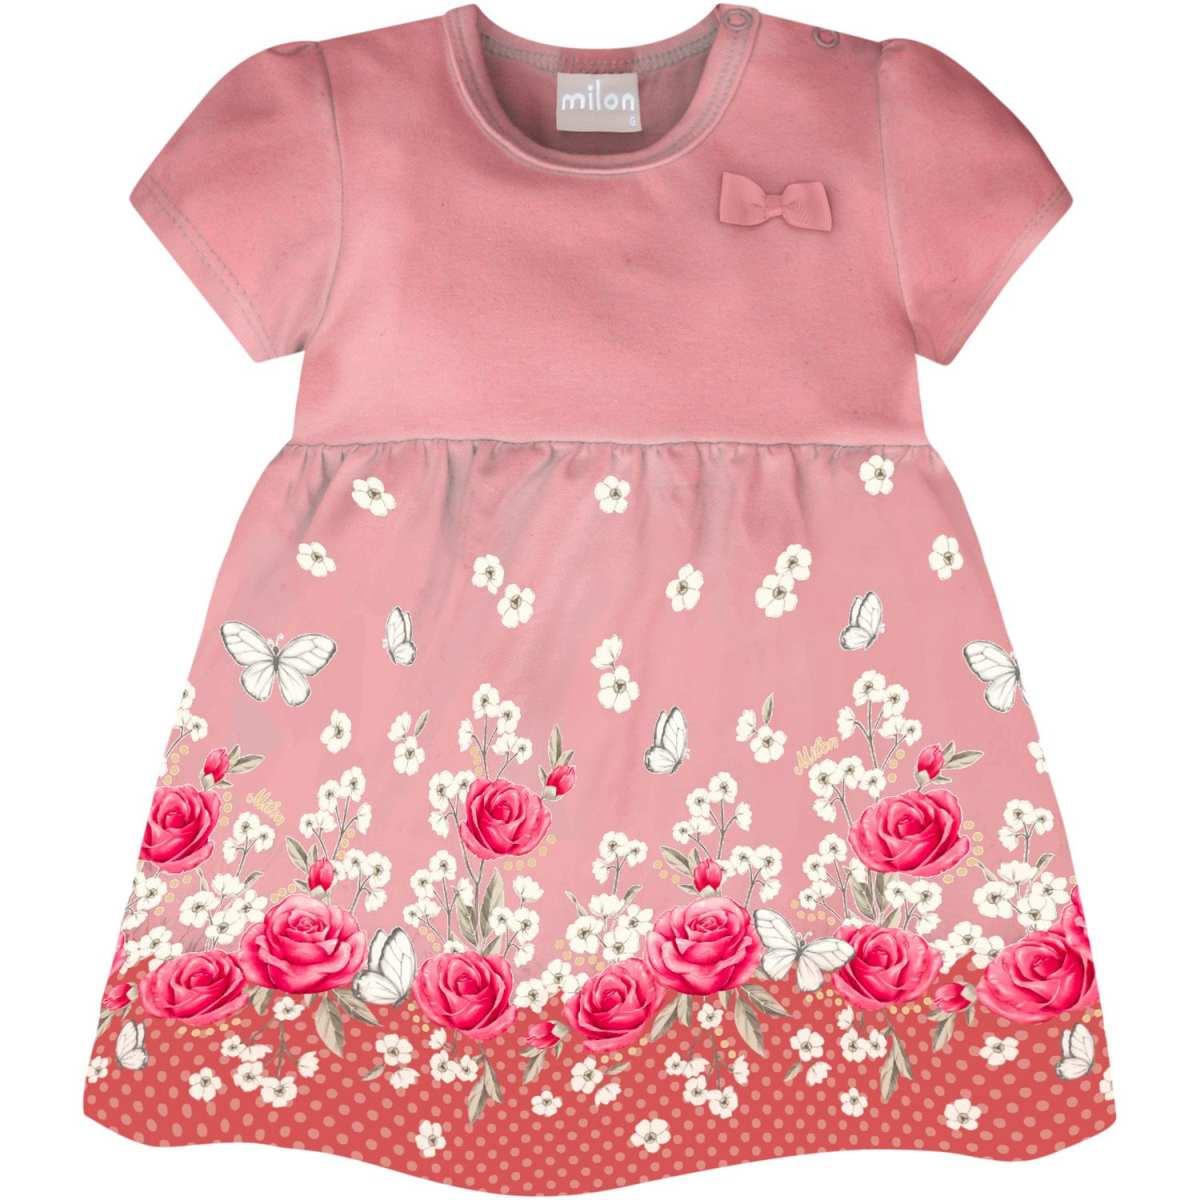 Vestido Bebê Menina Milon em Cotton - Rosa Creme